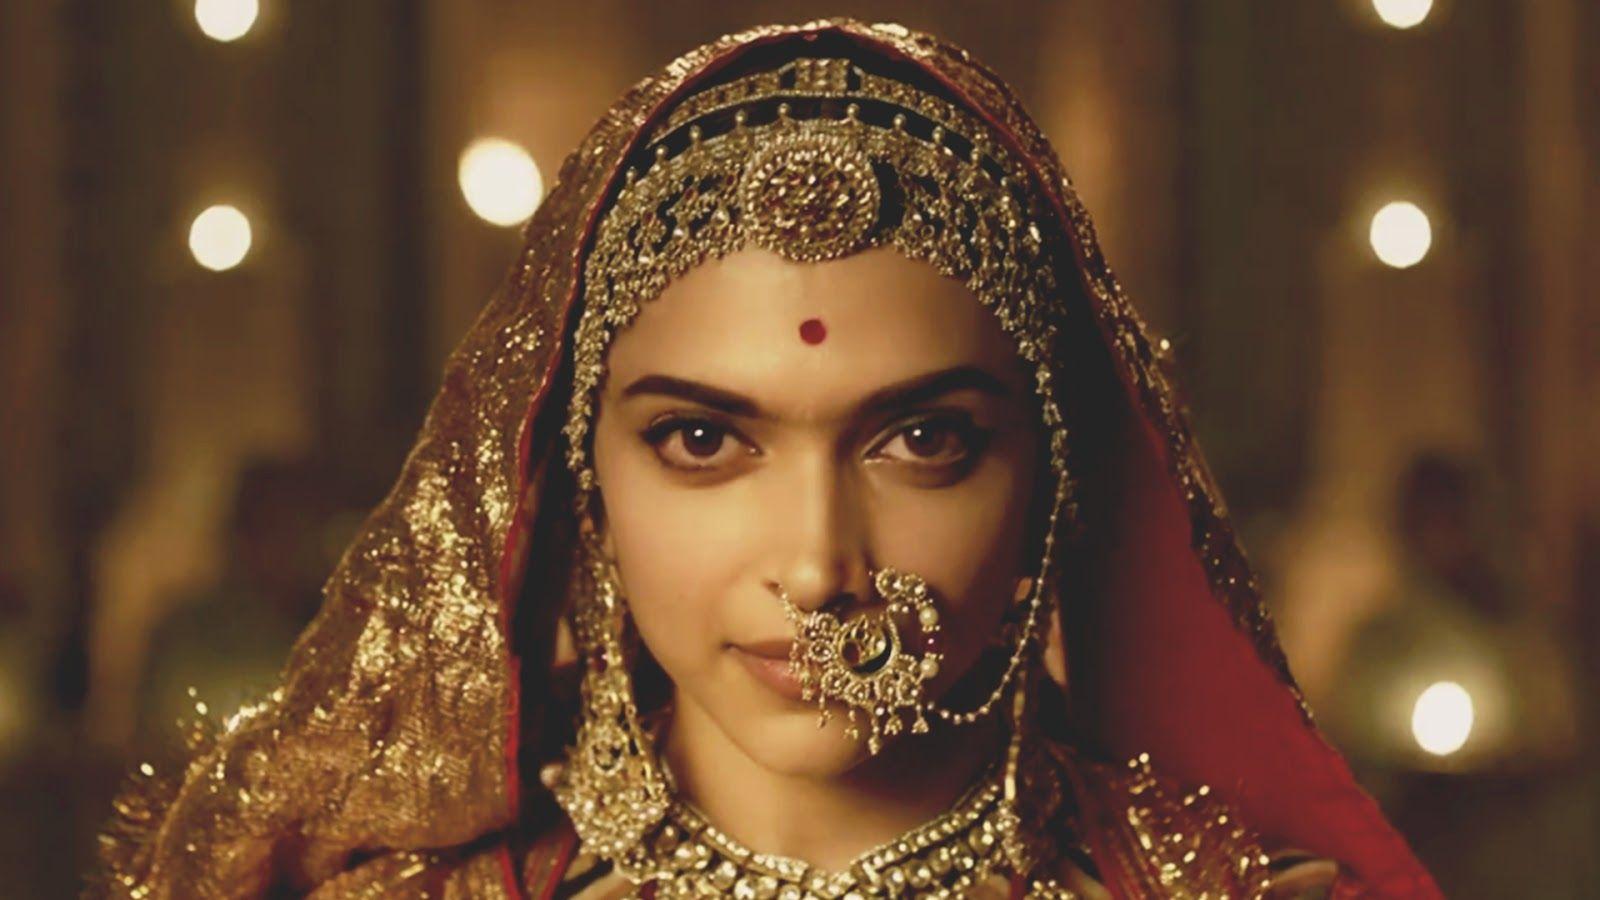 Dulhan Makeup Ideas 2014 For Girls Hd Wallpapers Free Download Pakistani Bridal Makeup Indian Bride Beautiful Bridal Makeup